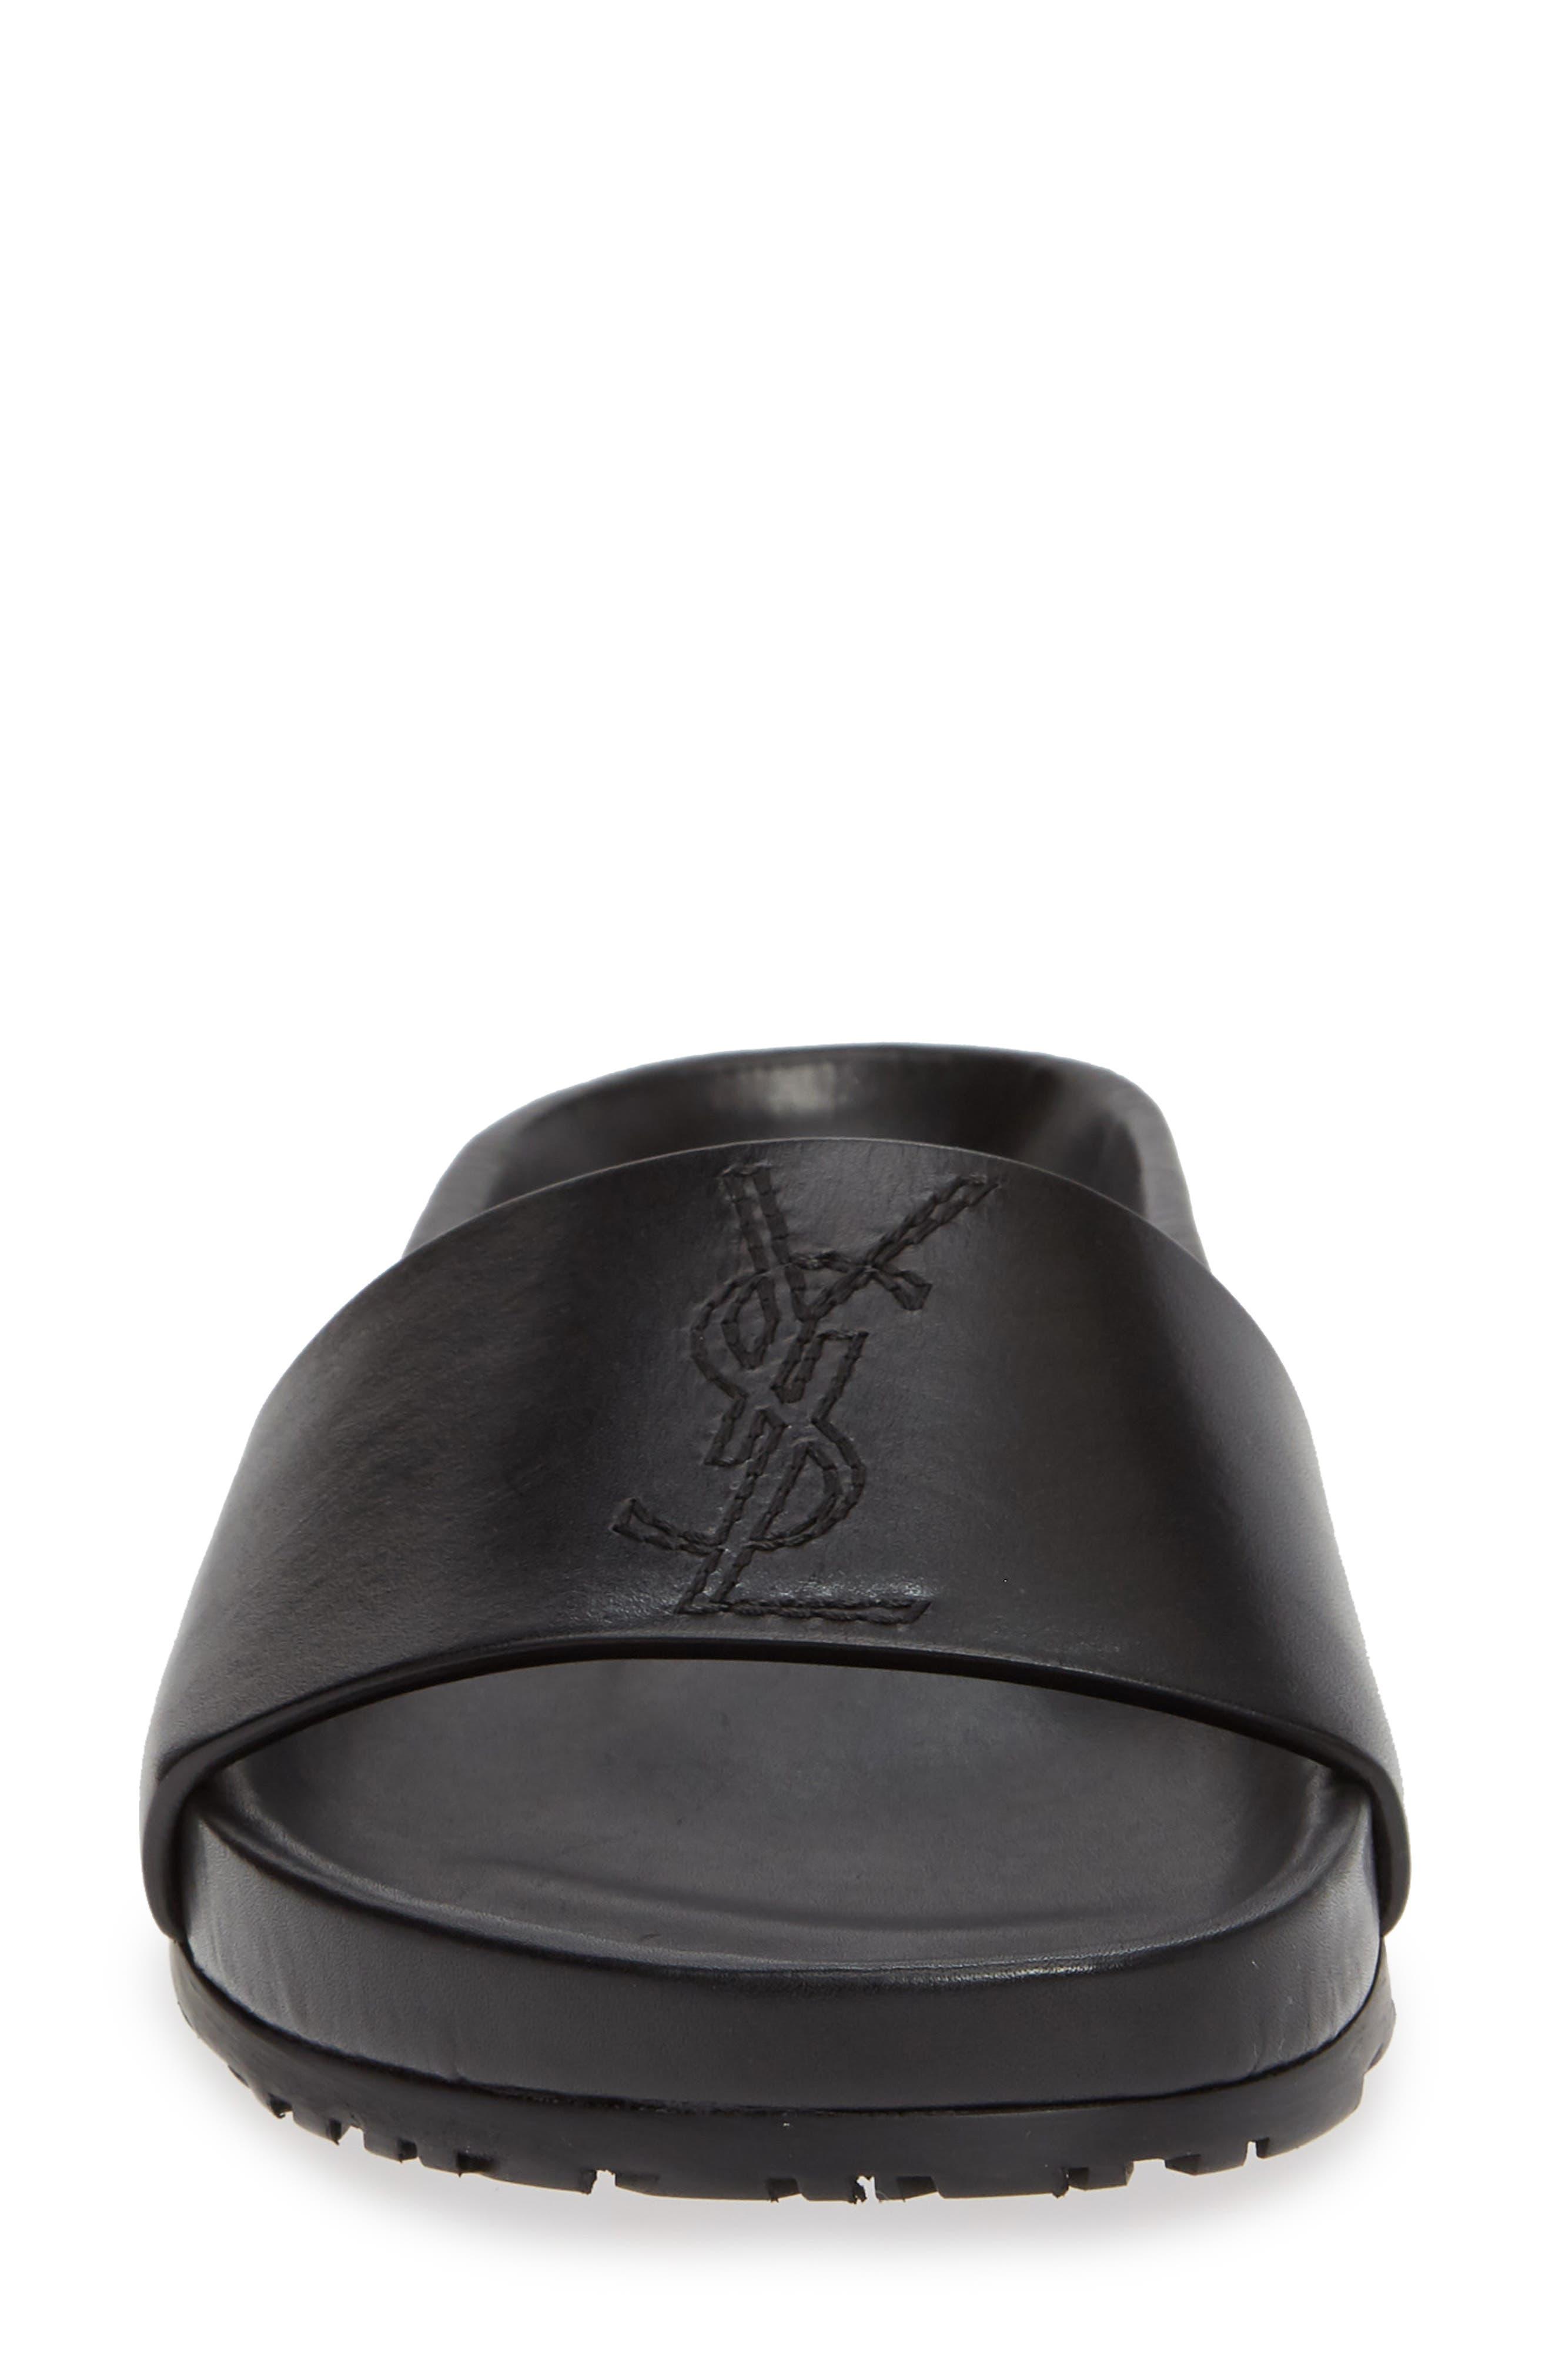 SAINT LAURENT,                             Jimmy Logo Slide Sandal,                             Alternate thumbnail 4, color,                             BLACK LEATHER